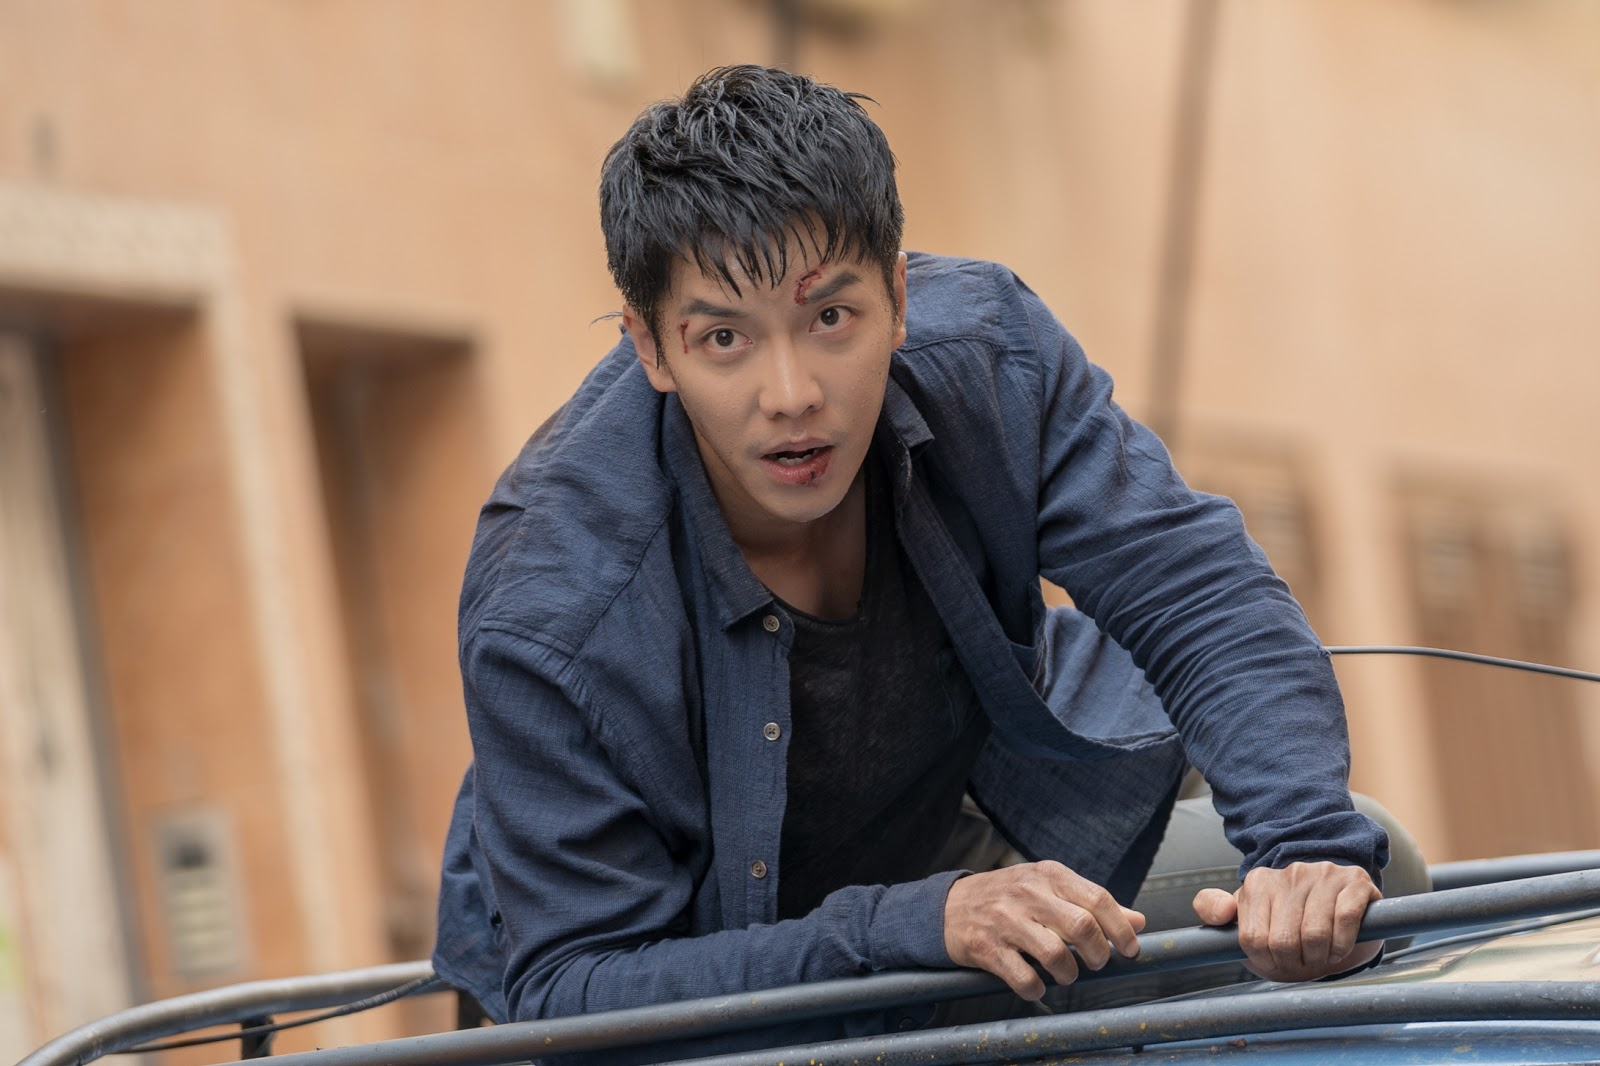 vagabond cast director 1